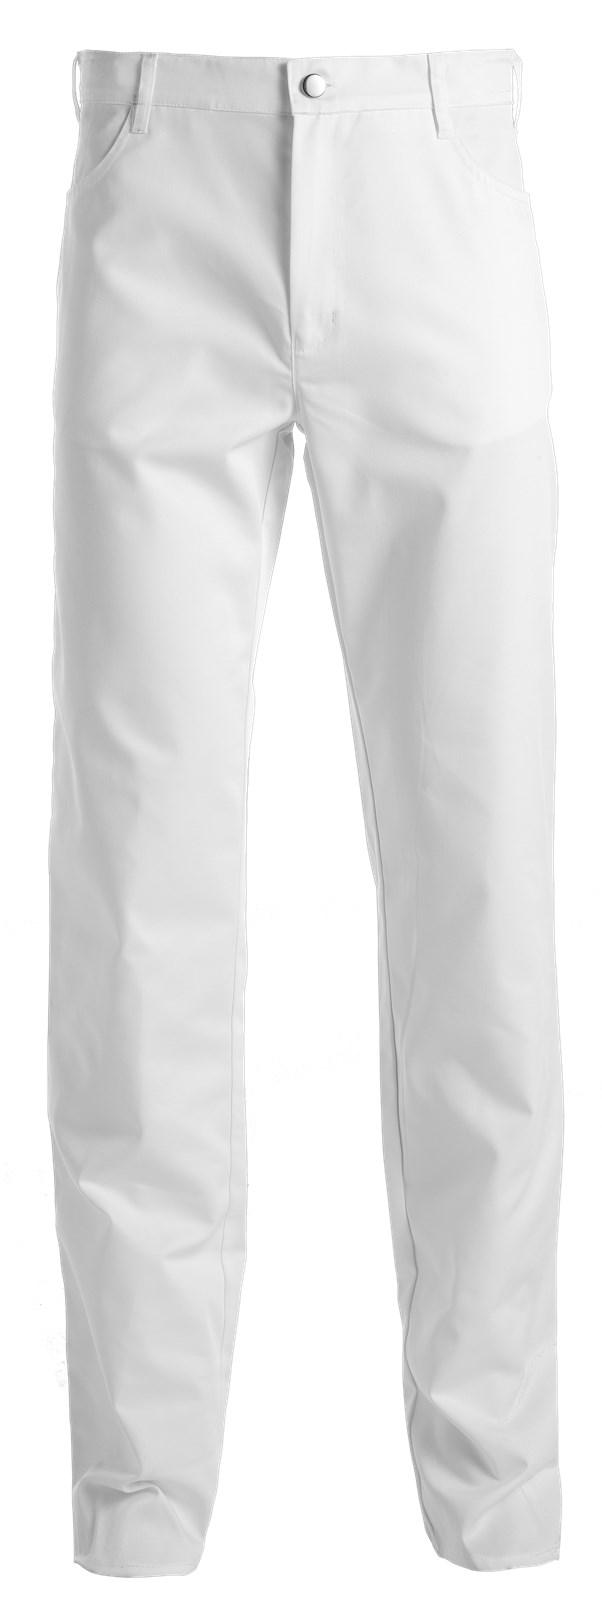 dames jeans wit